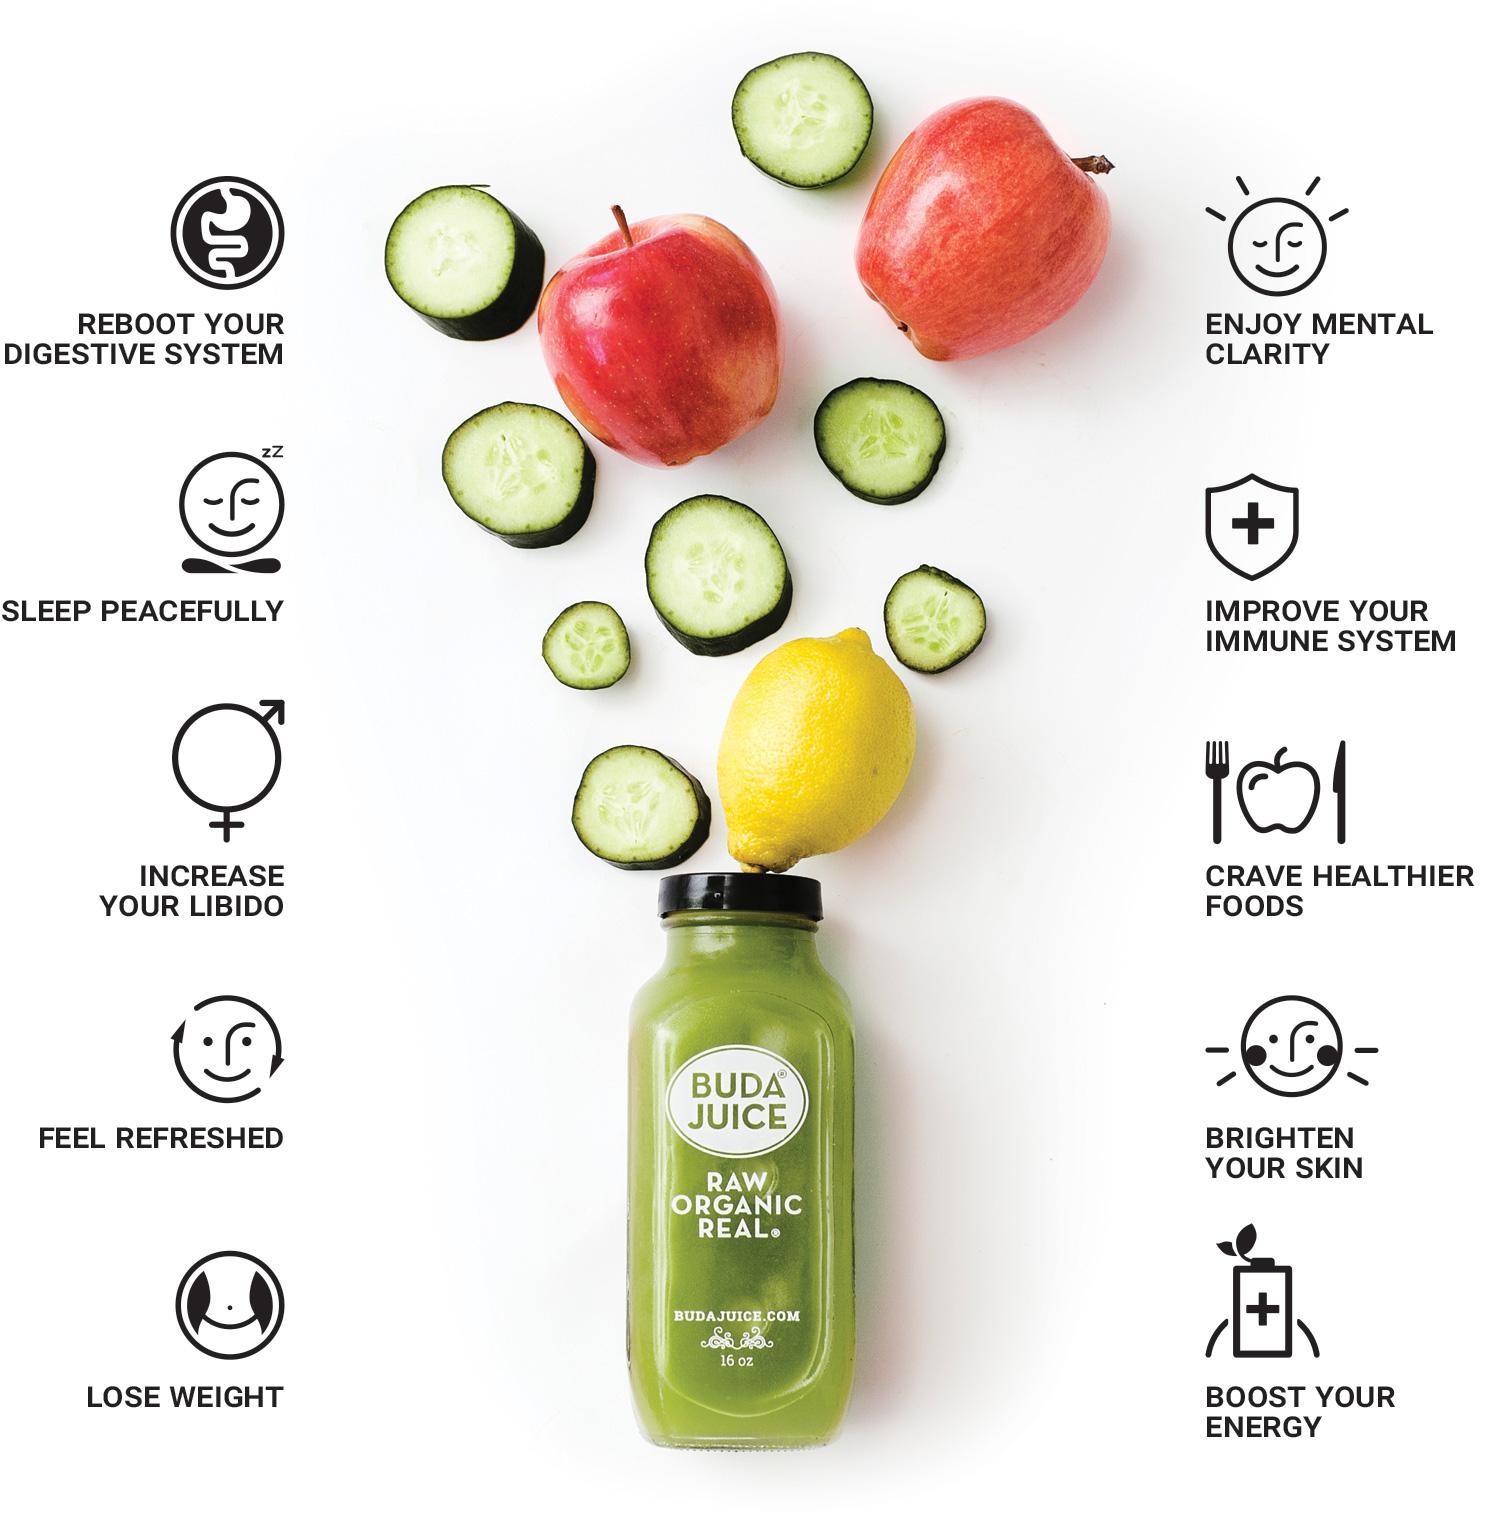 Cleanse detox cold pressed organic juice dallas plano frisco buda cleanse benefits solutioingenieria Choice Image